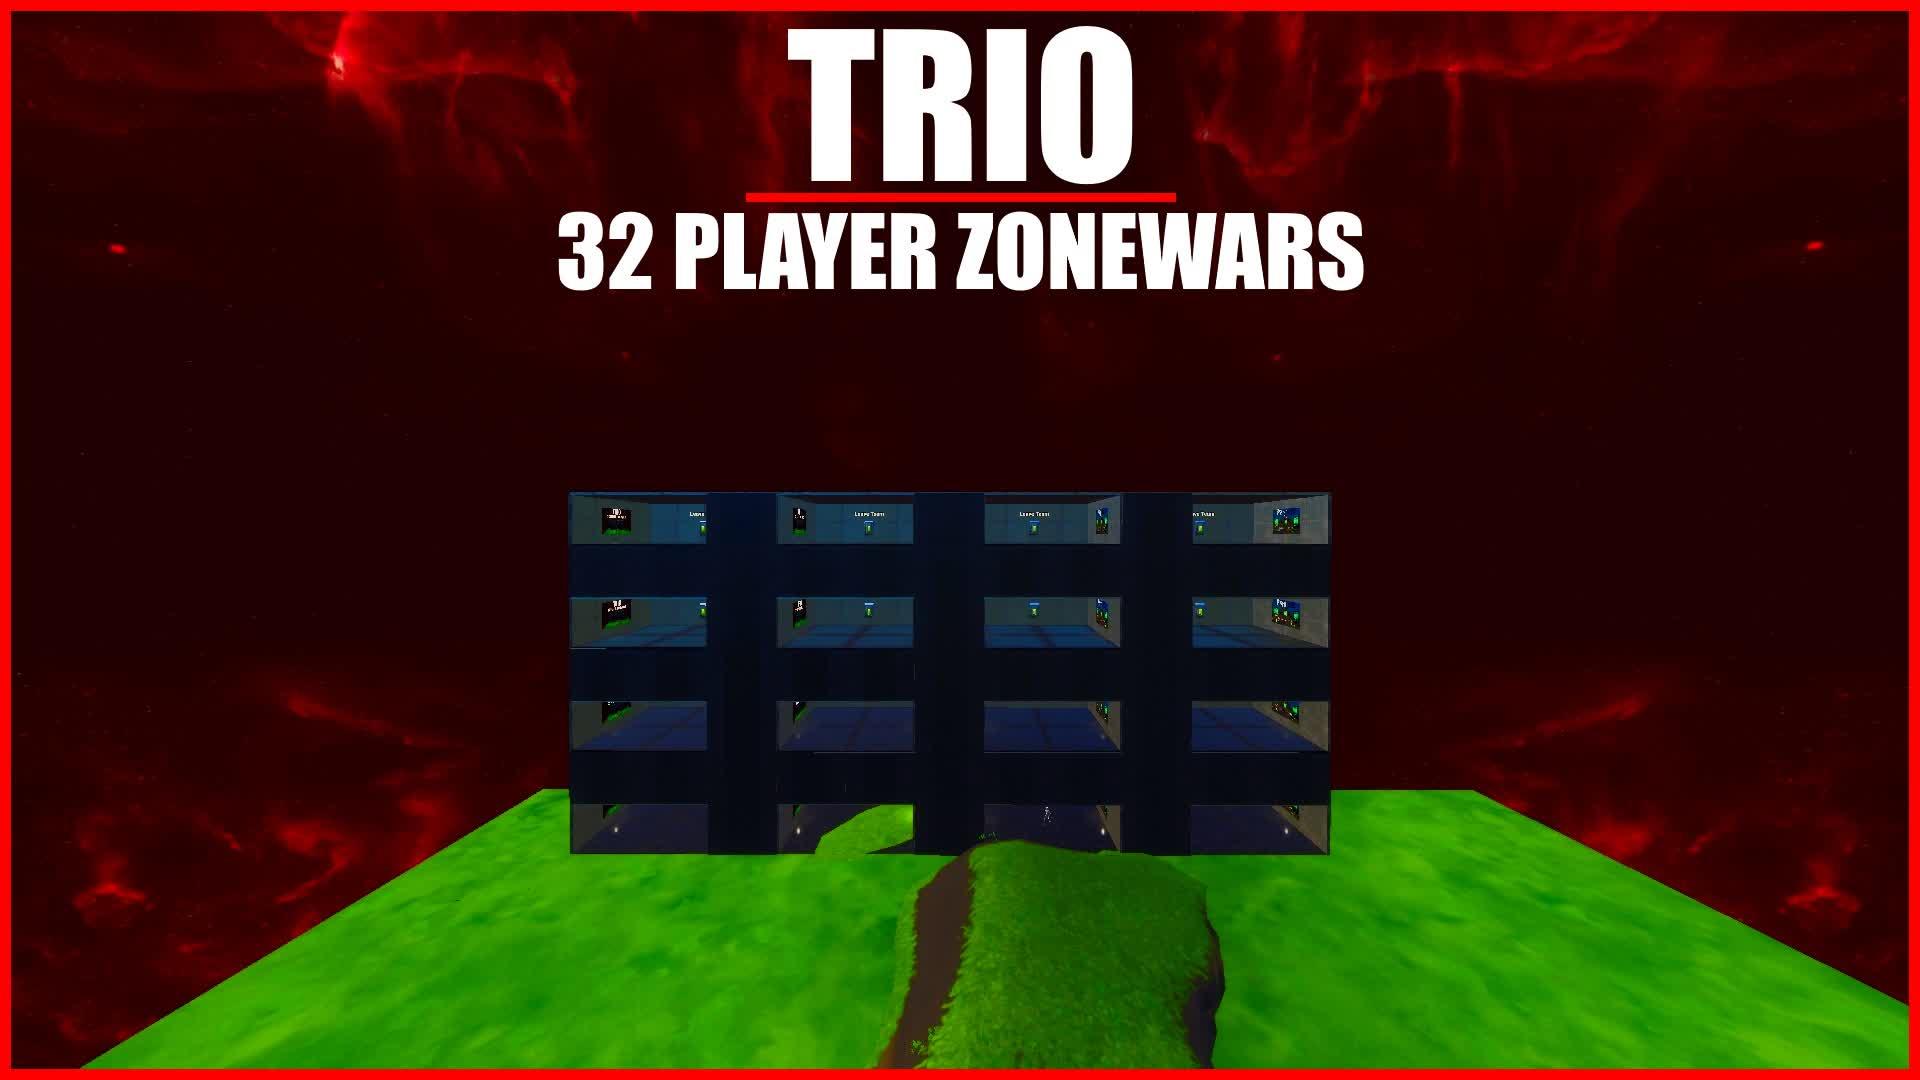 Simple TRIO ZoneWars [32 Players] 😎😎😎 1469-2440-9680 by pandvilnetwork